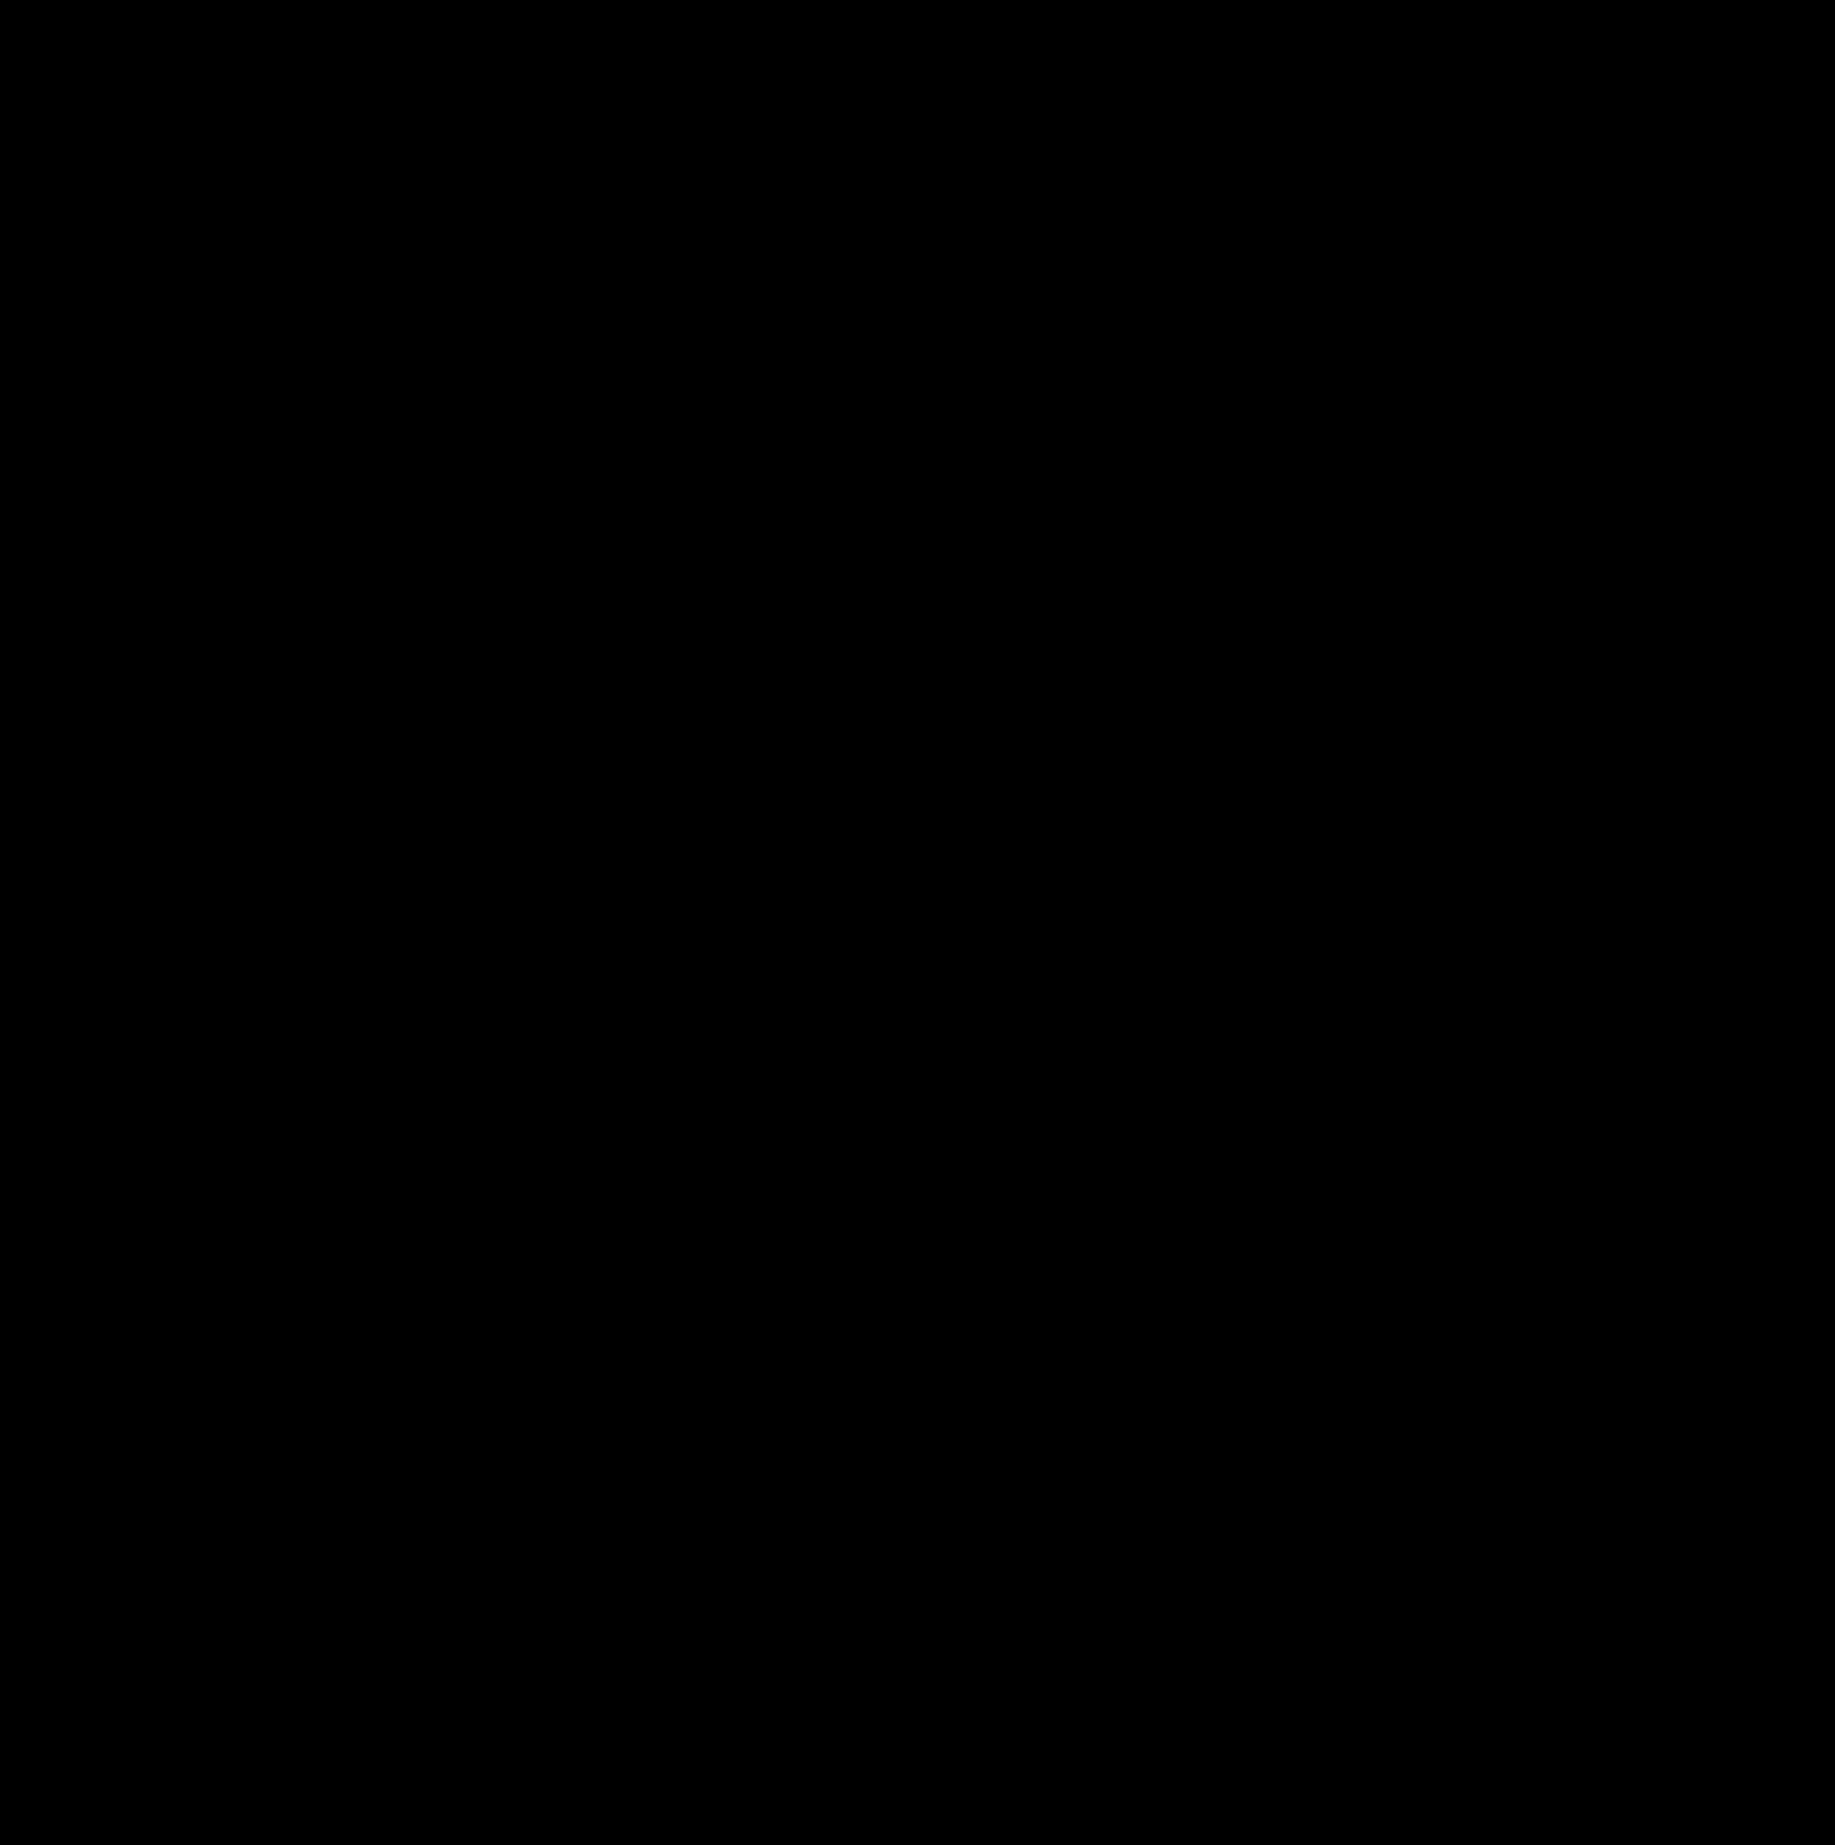 1835x1845 Turkey Black And White Turkey Clipart Black And White Free Clip